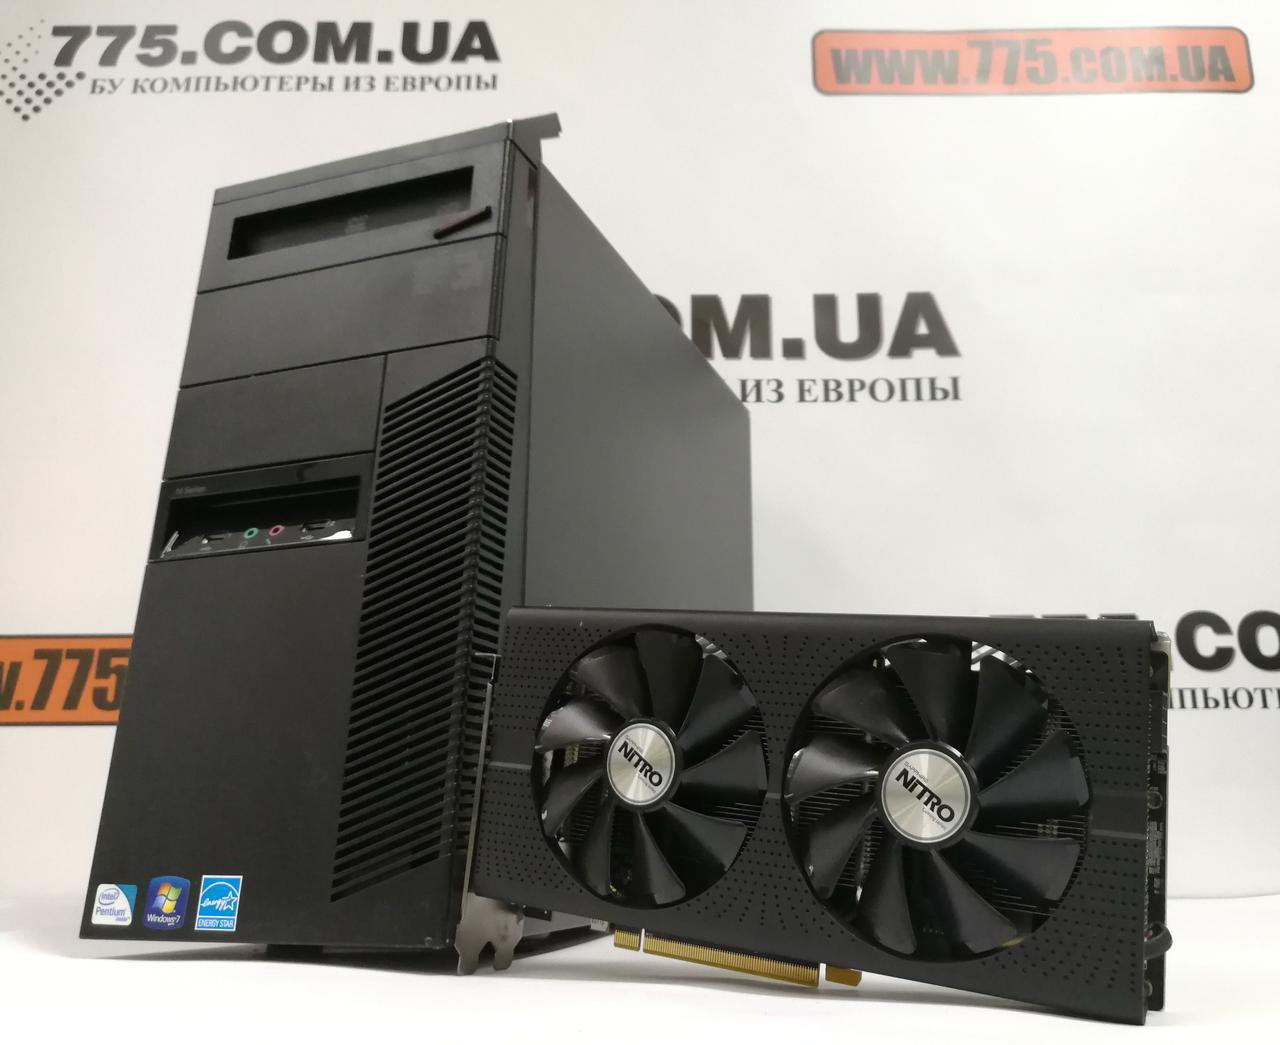 Компьютер Lenovo M81, Intel Core i5-2400 3.4GHz, RAM 8ГБ, SSD 120ГБ, HDD 500ГБ, Radeon RX570 4GB